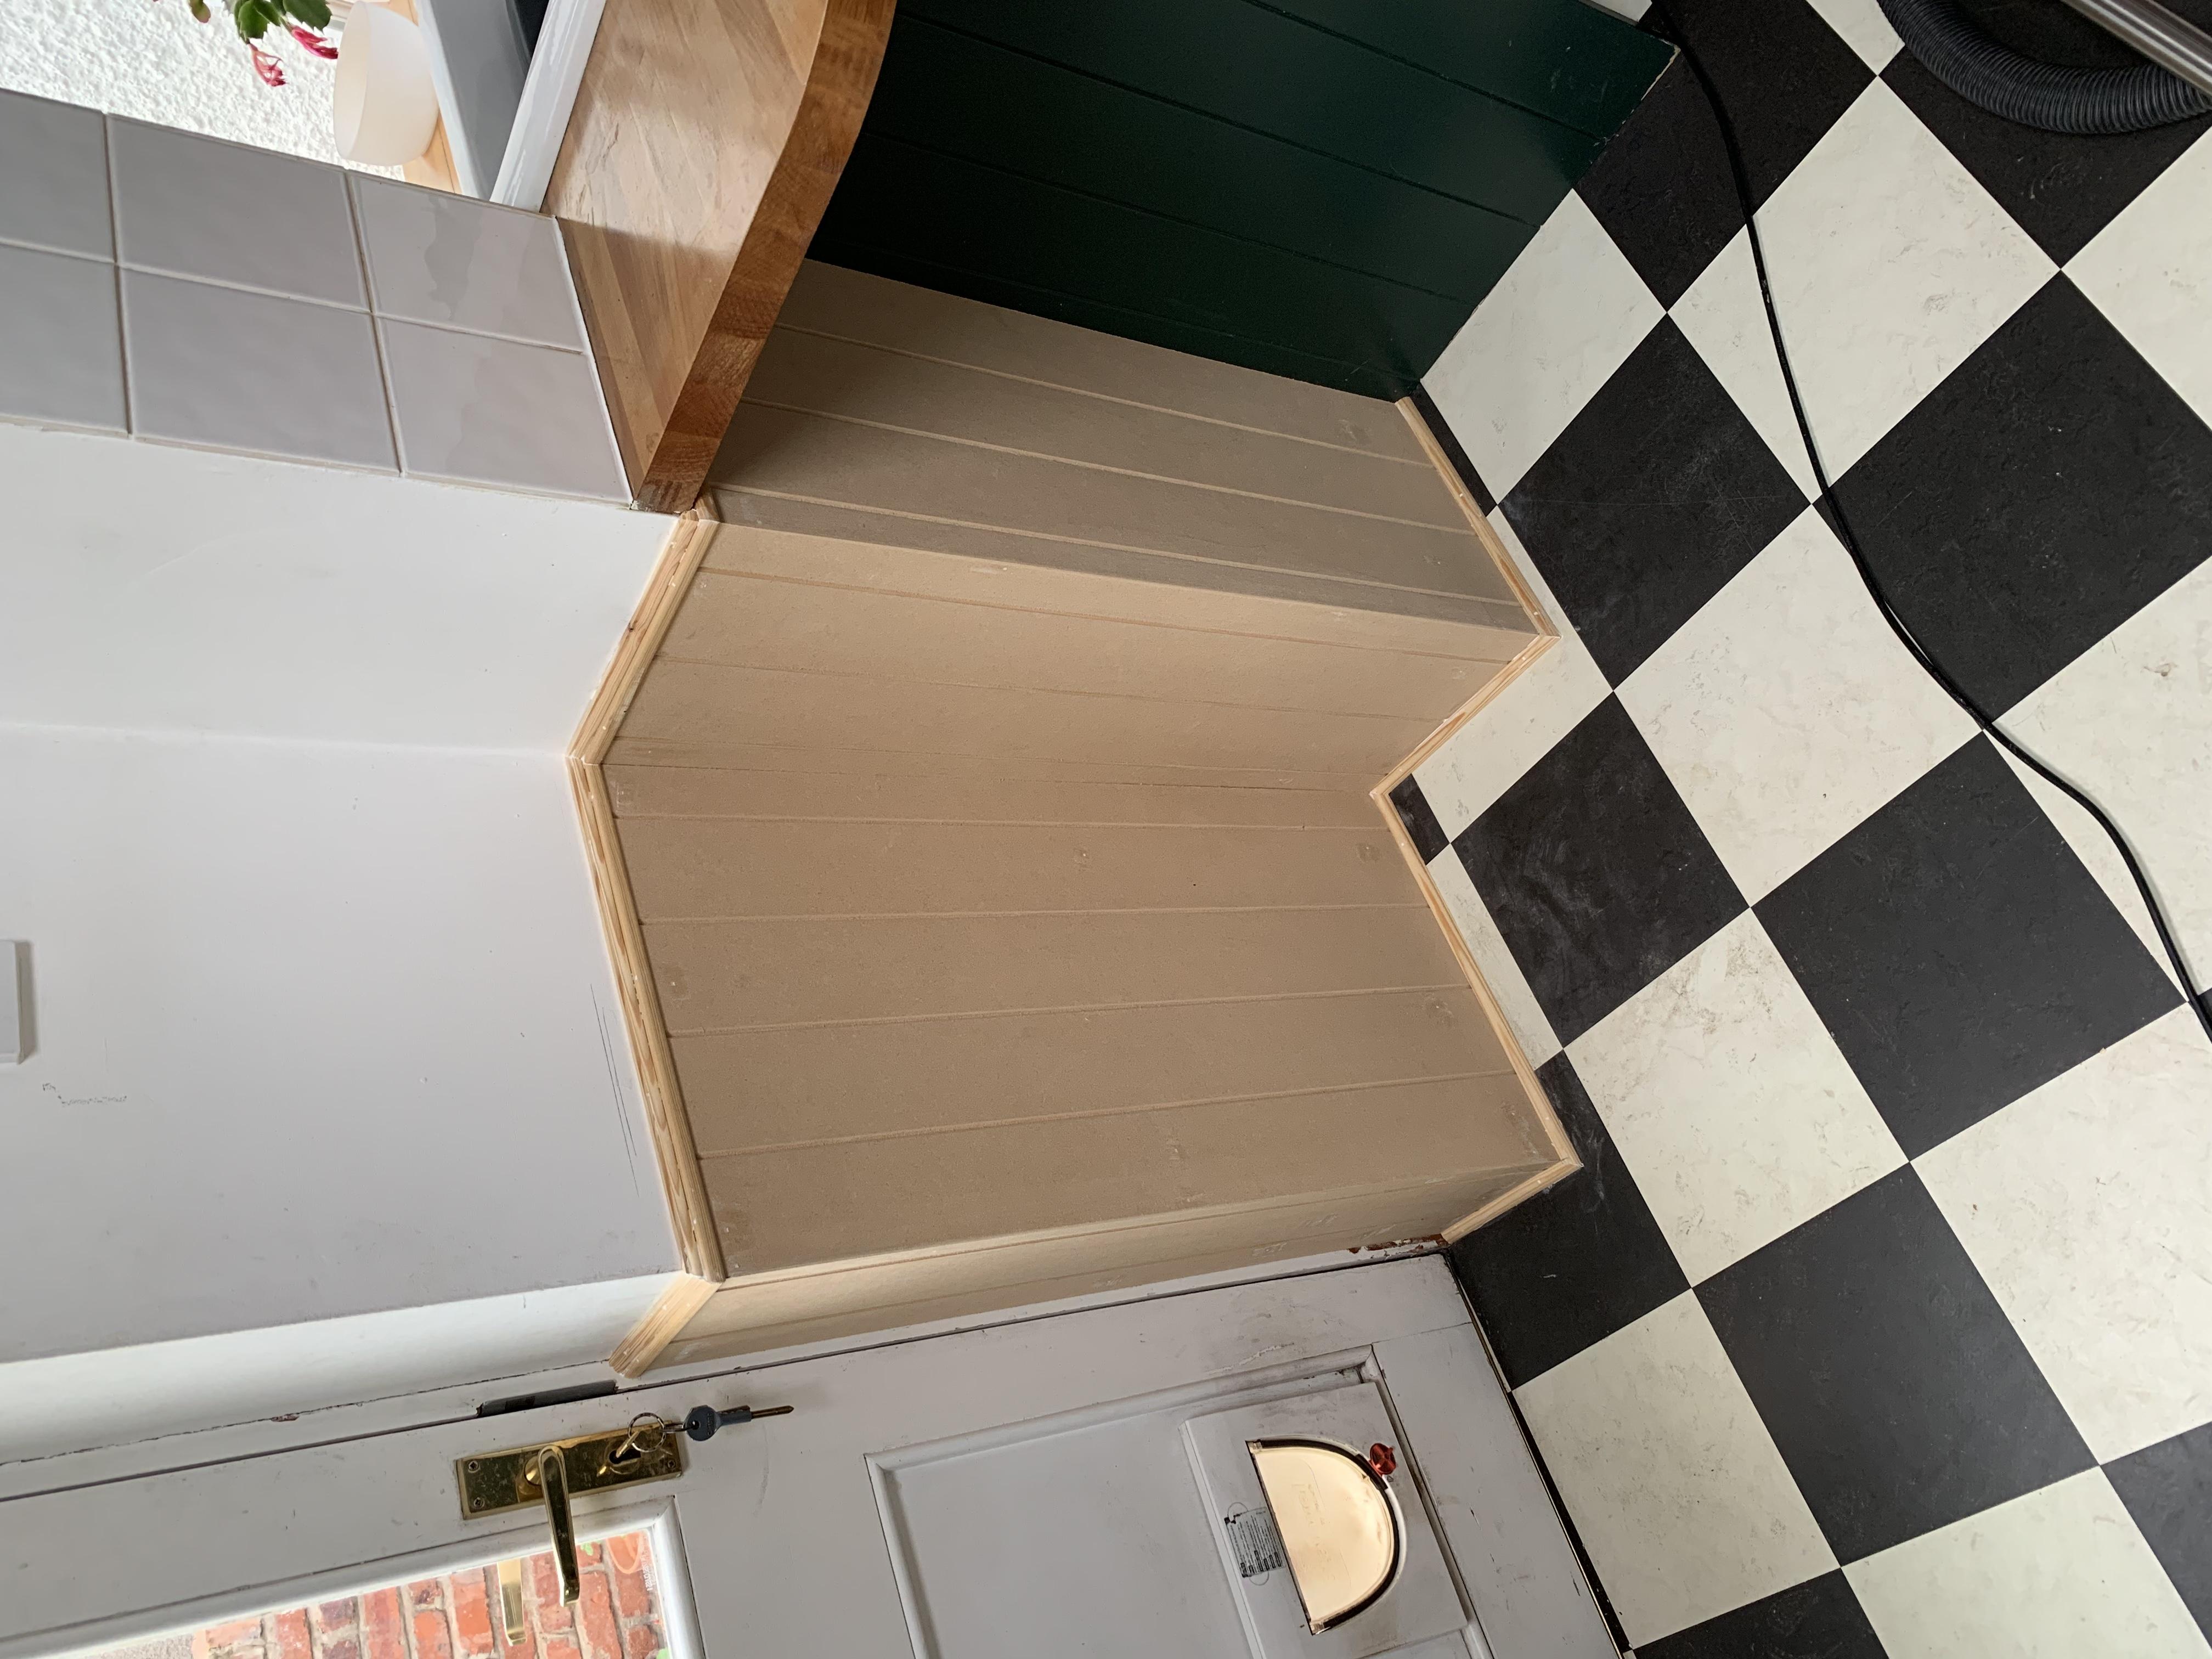 V-grooved MDF to match existing kitchen end panels